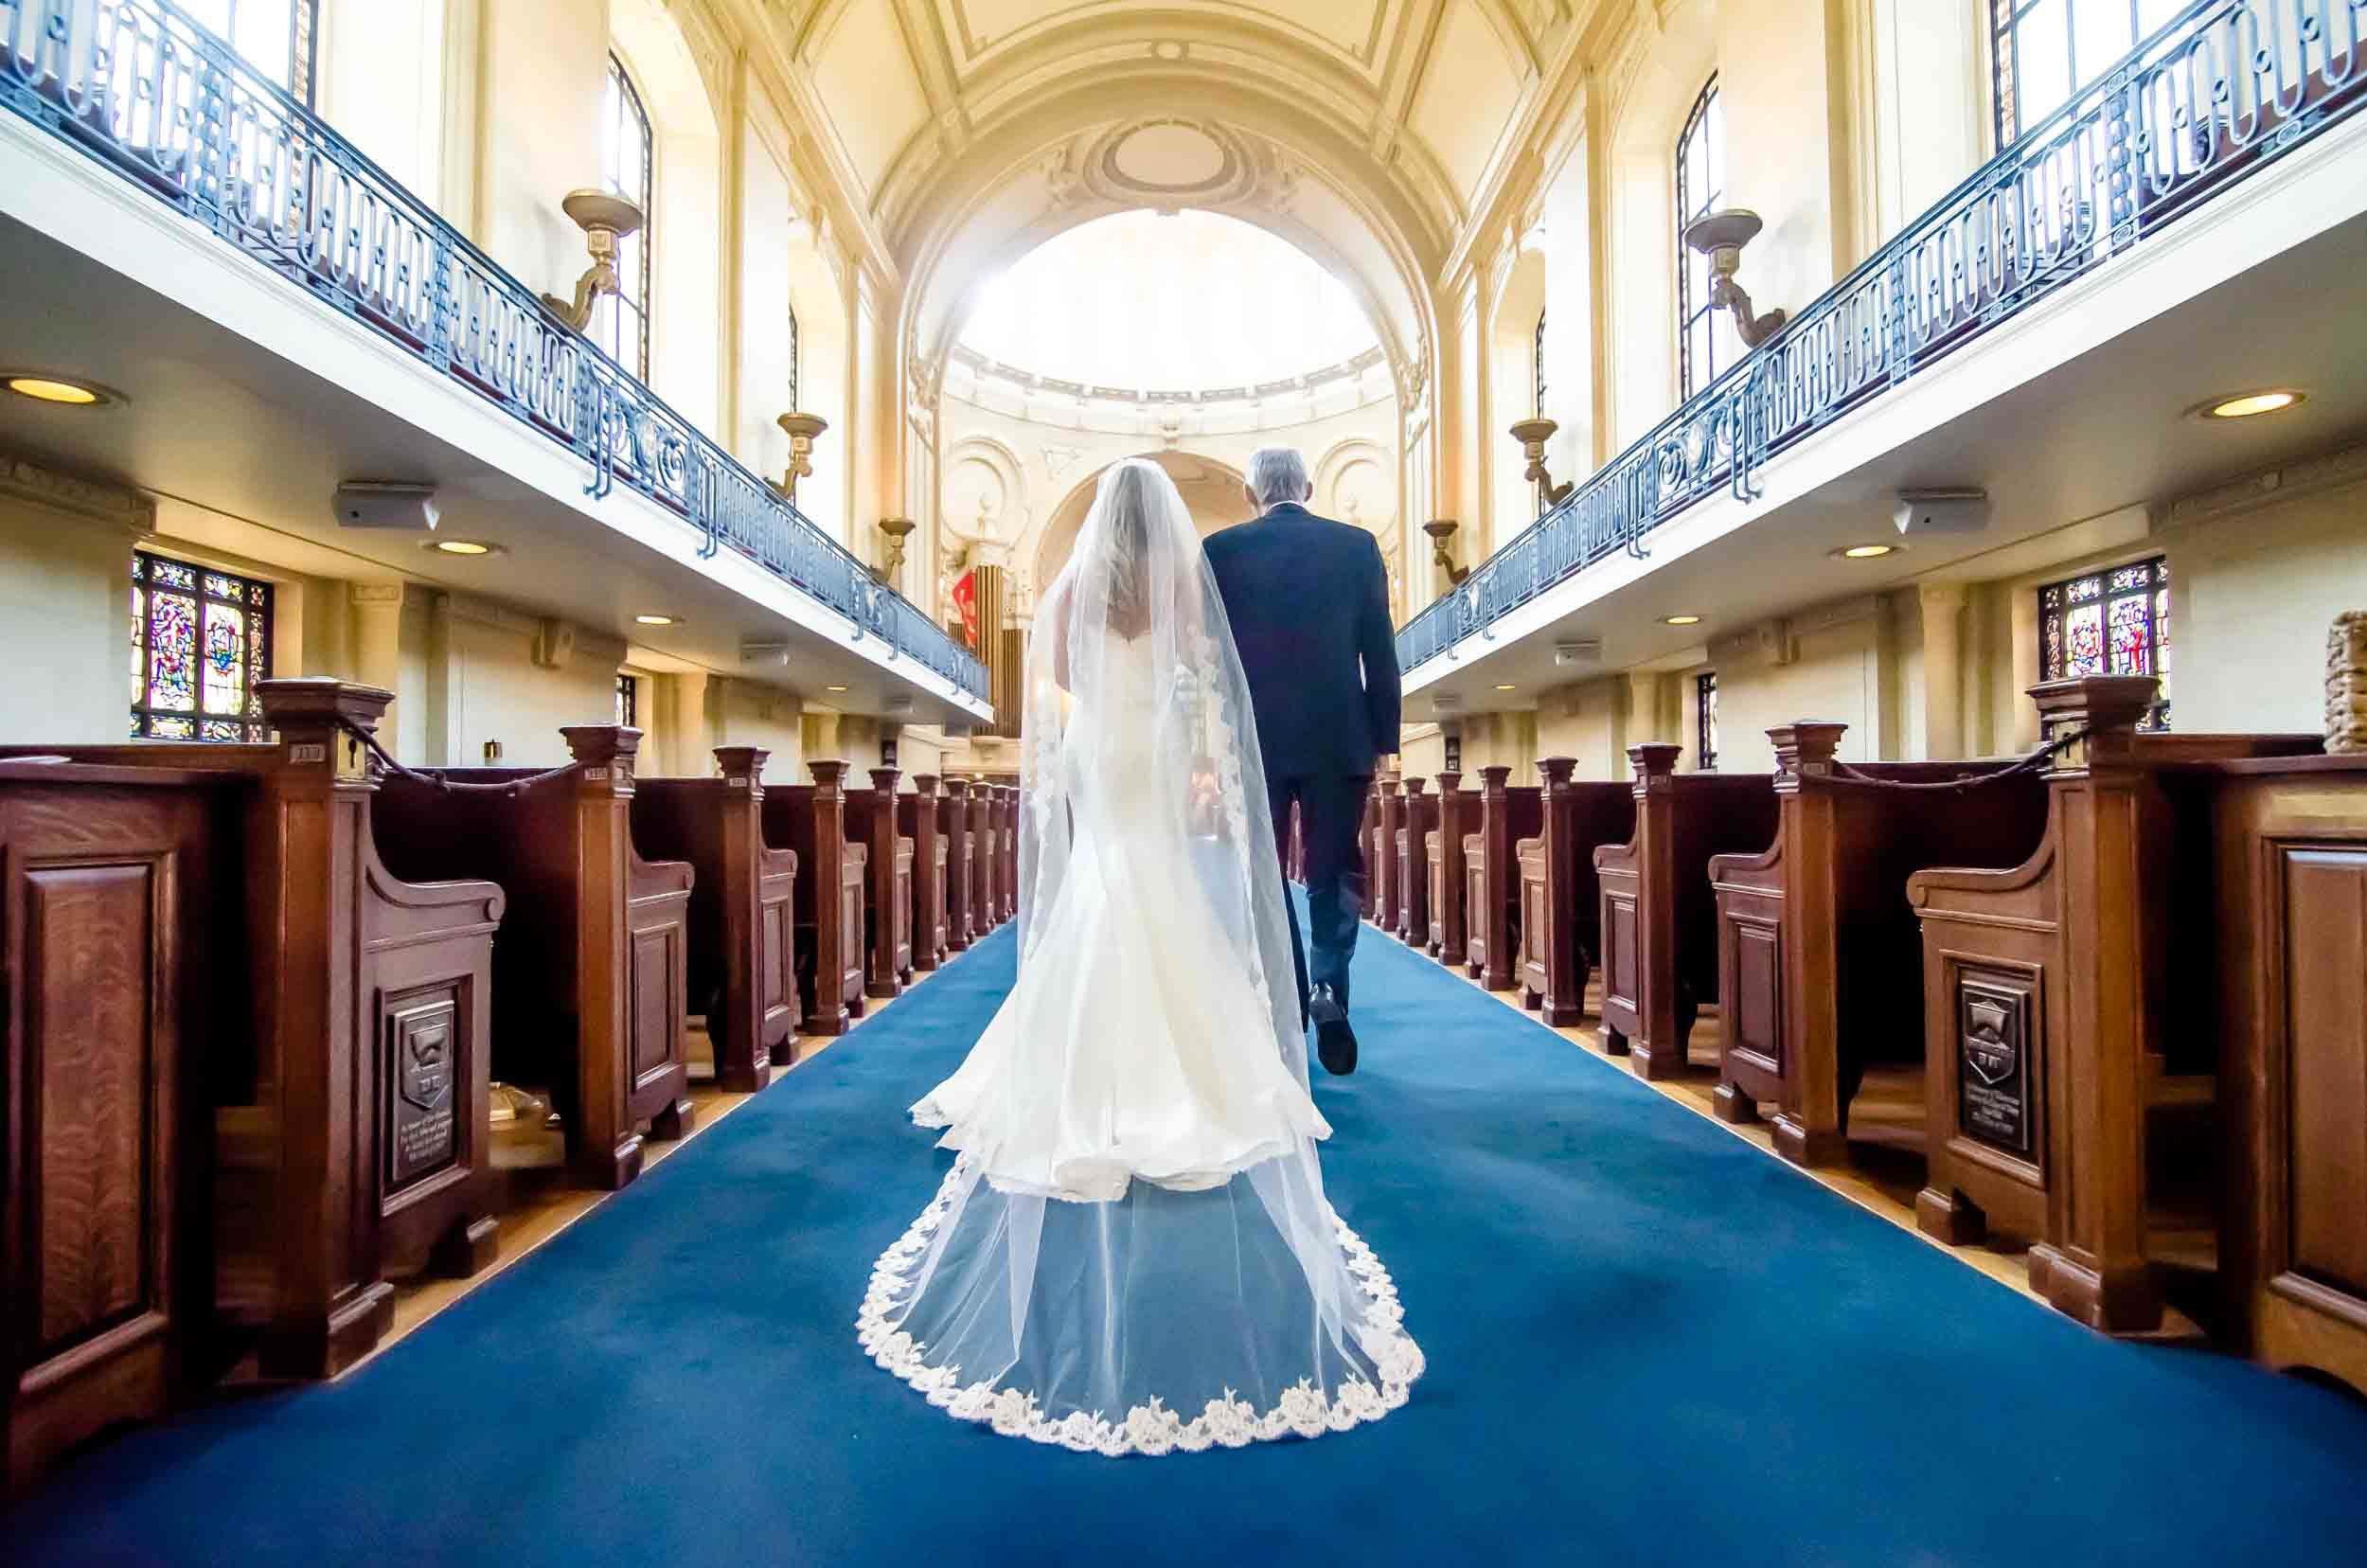 dc+metro+wedding+photographer+vadym+guliuk+photography+wedding+ceremony-2020.jpg